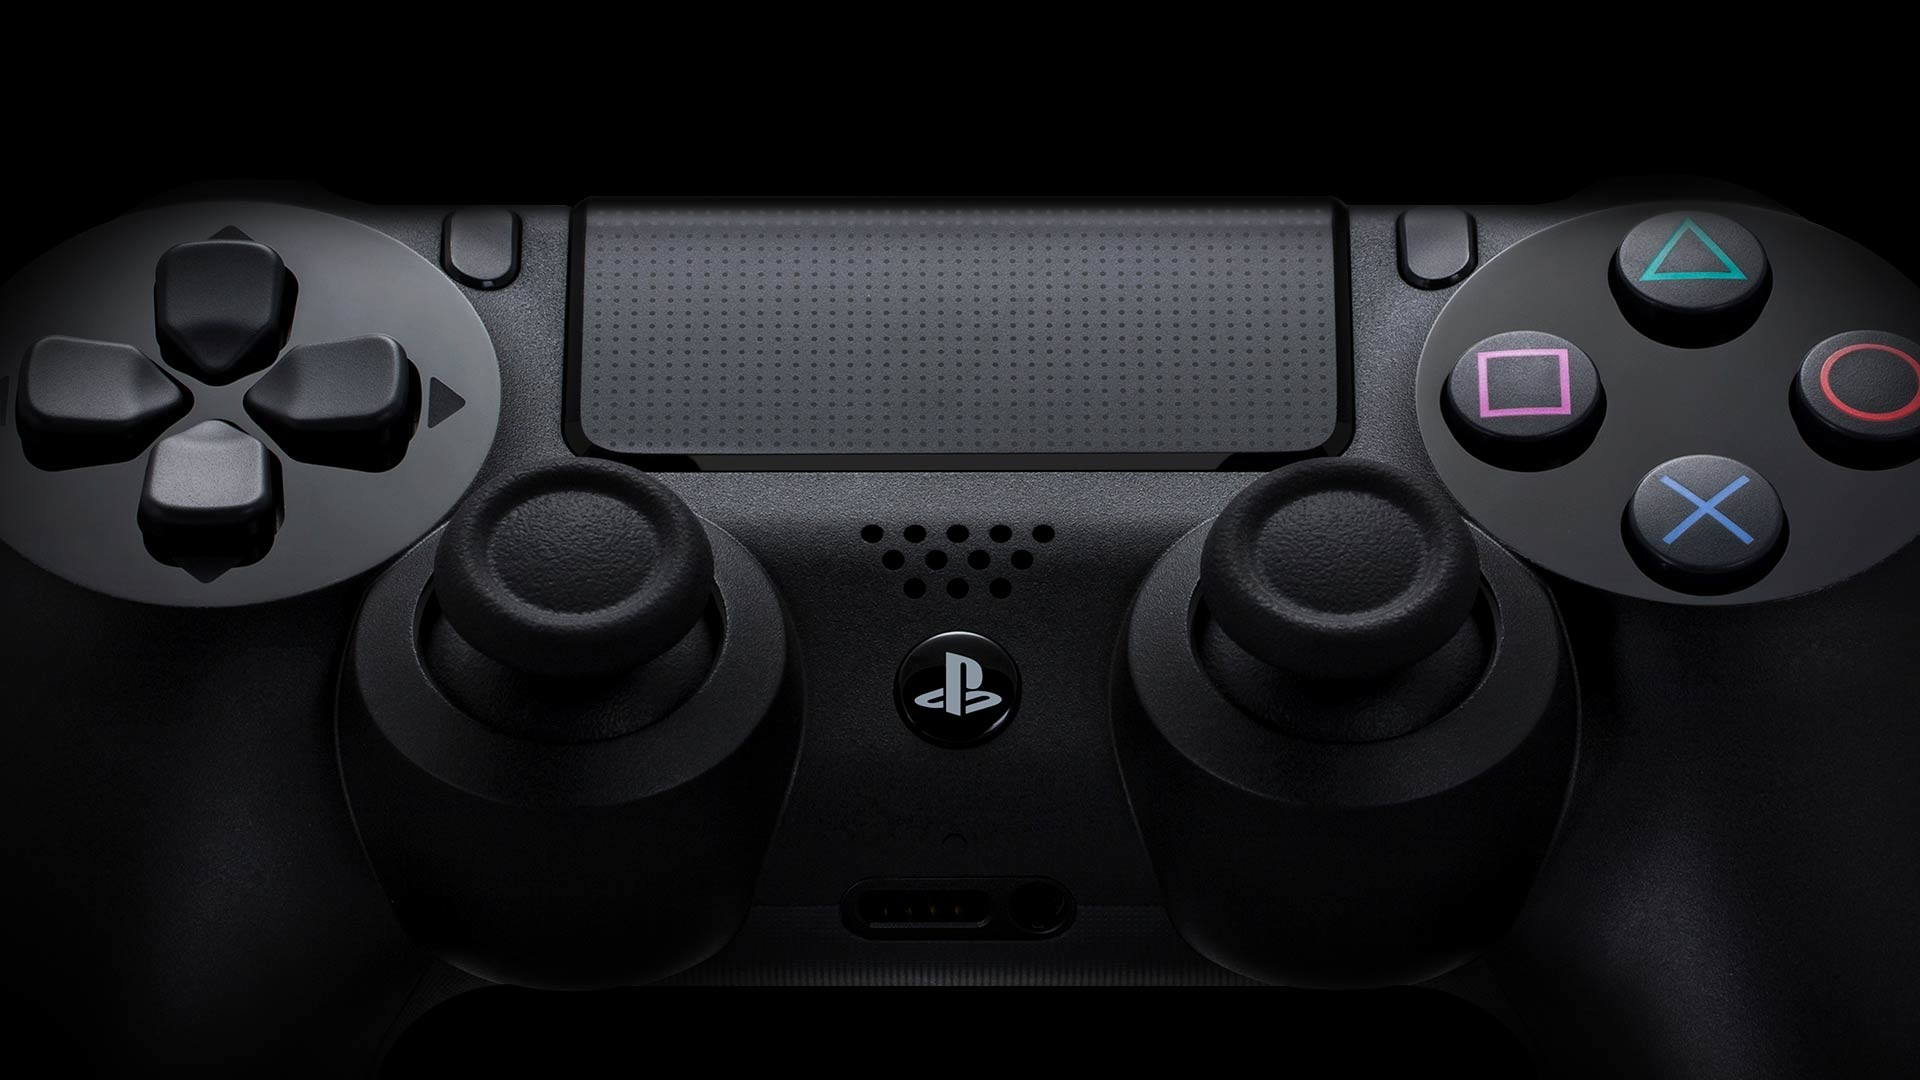 Playstation 4 Digital Wallpapers [152] – HD Wallpaper Backgrounds